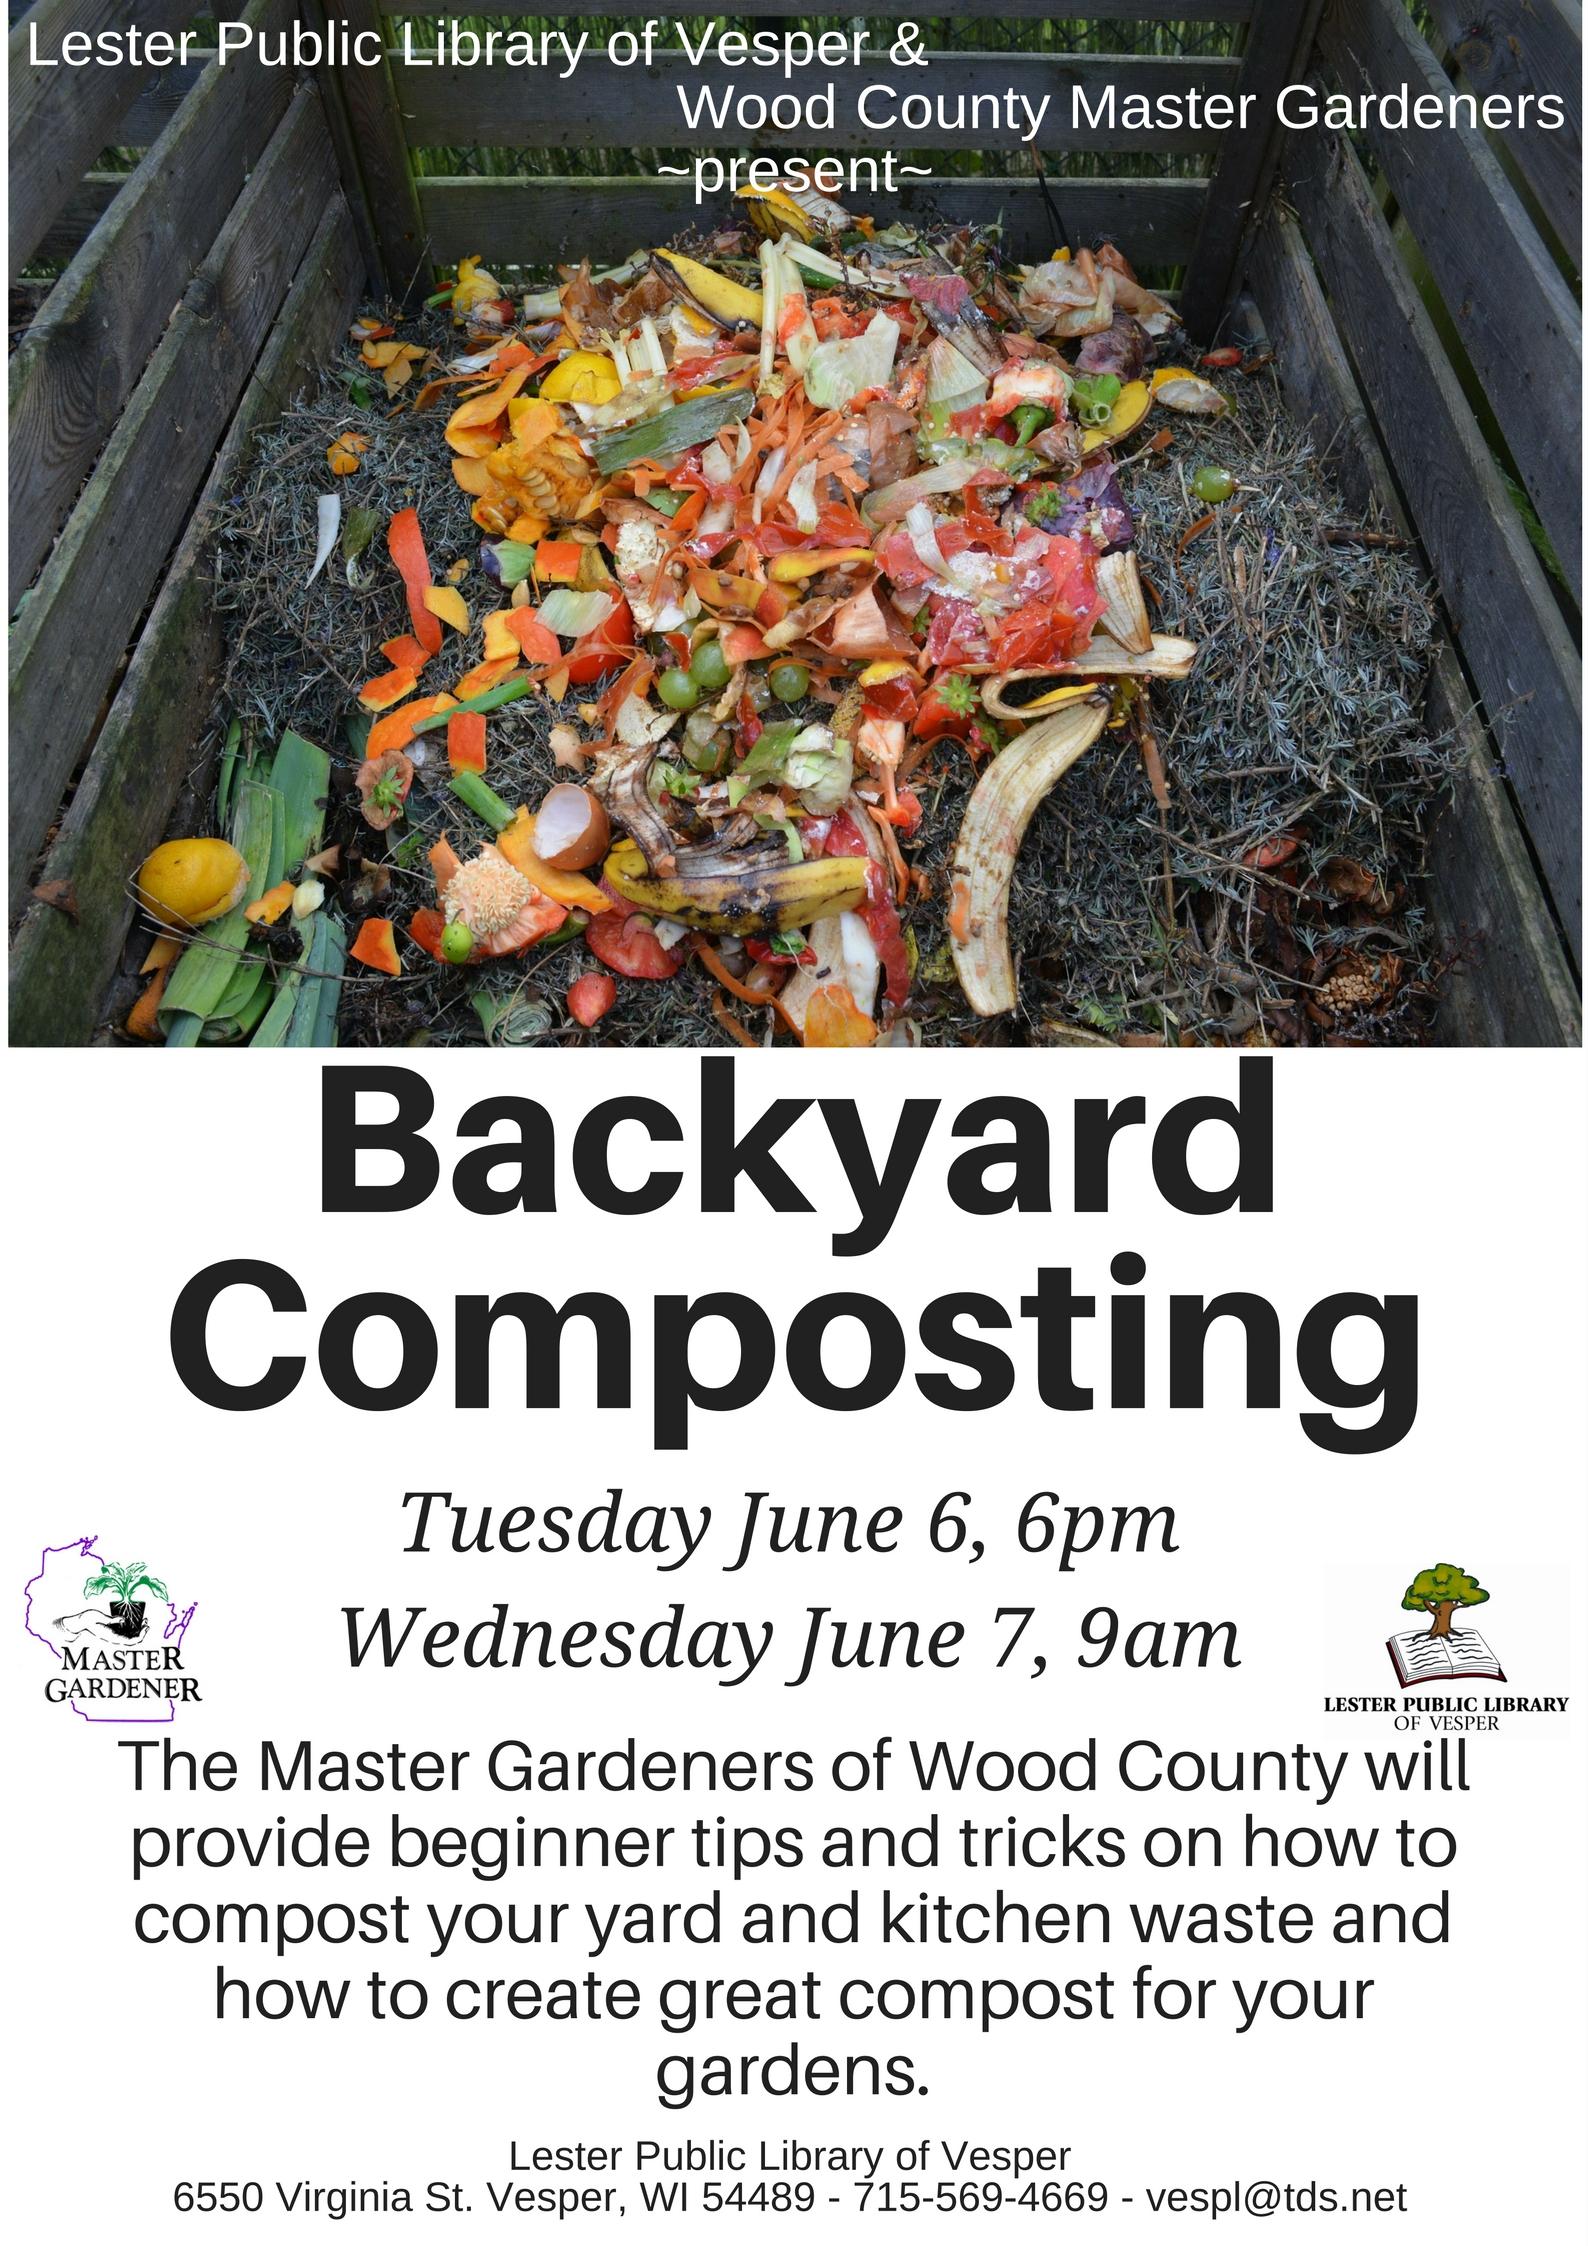 backyard composting june 6 6pm or june 7 9am lester public